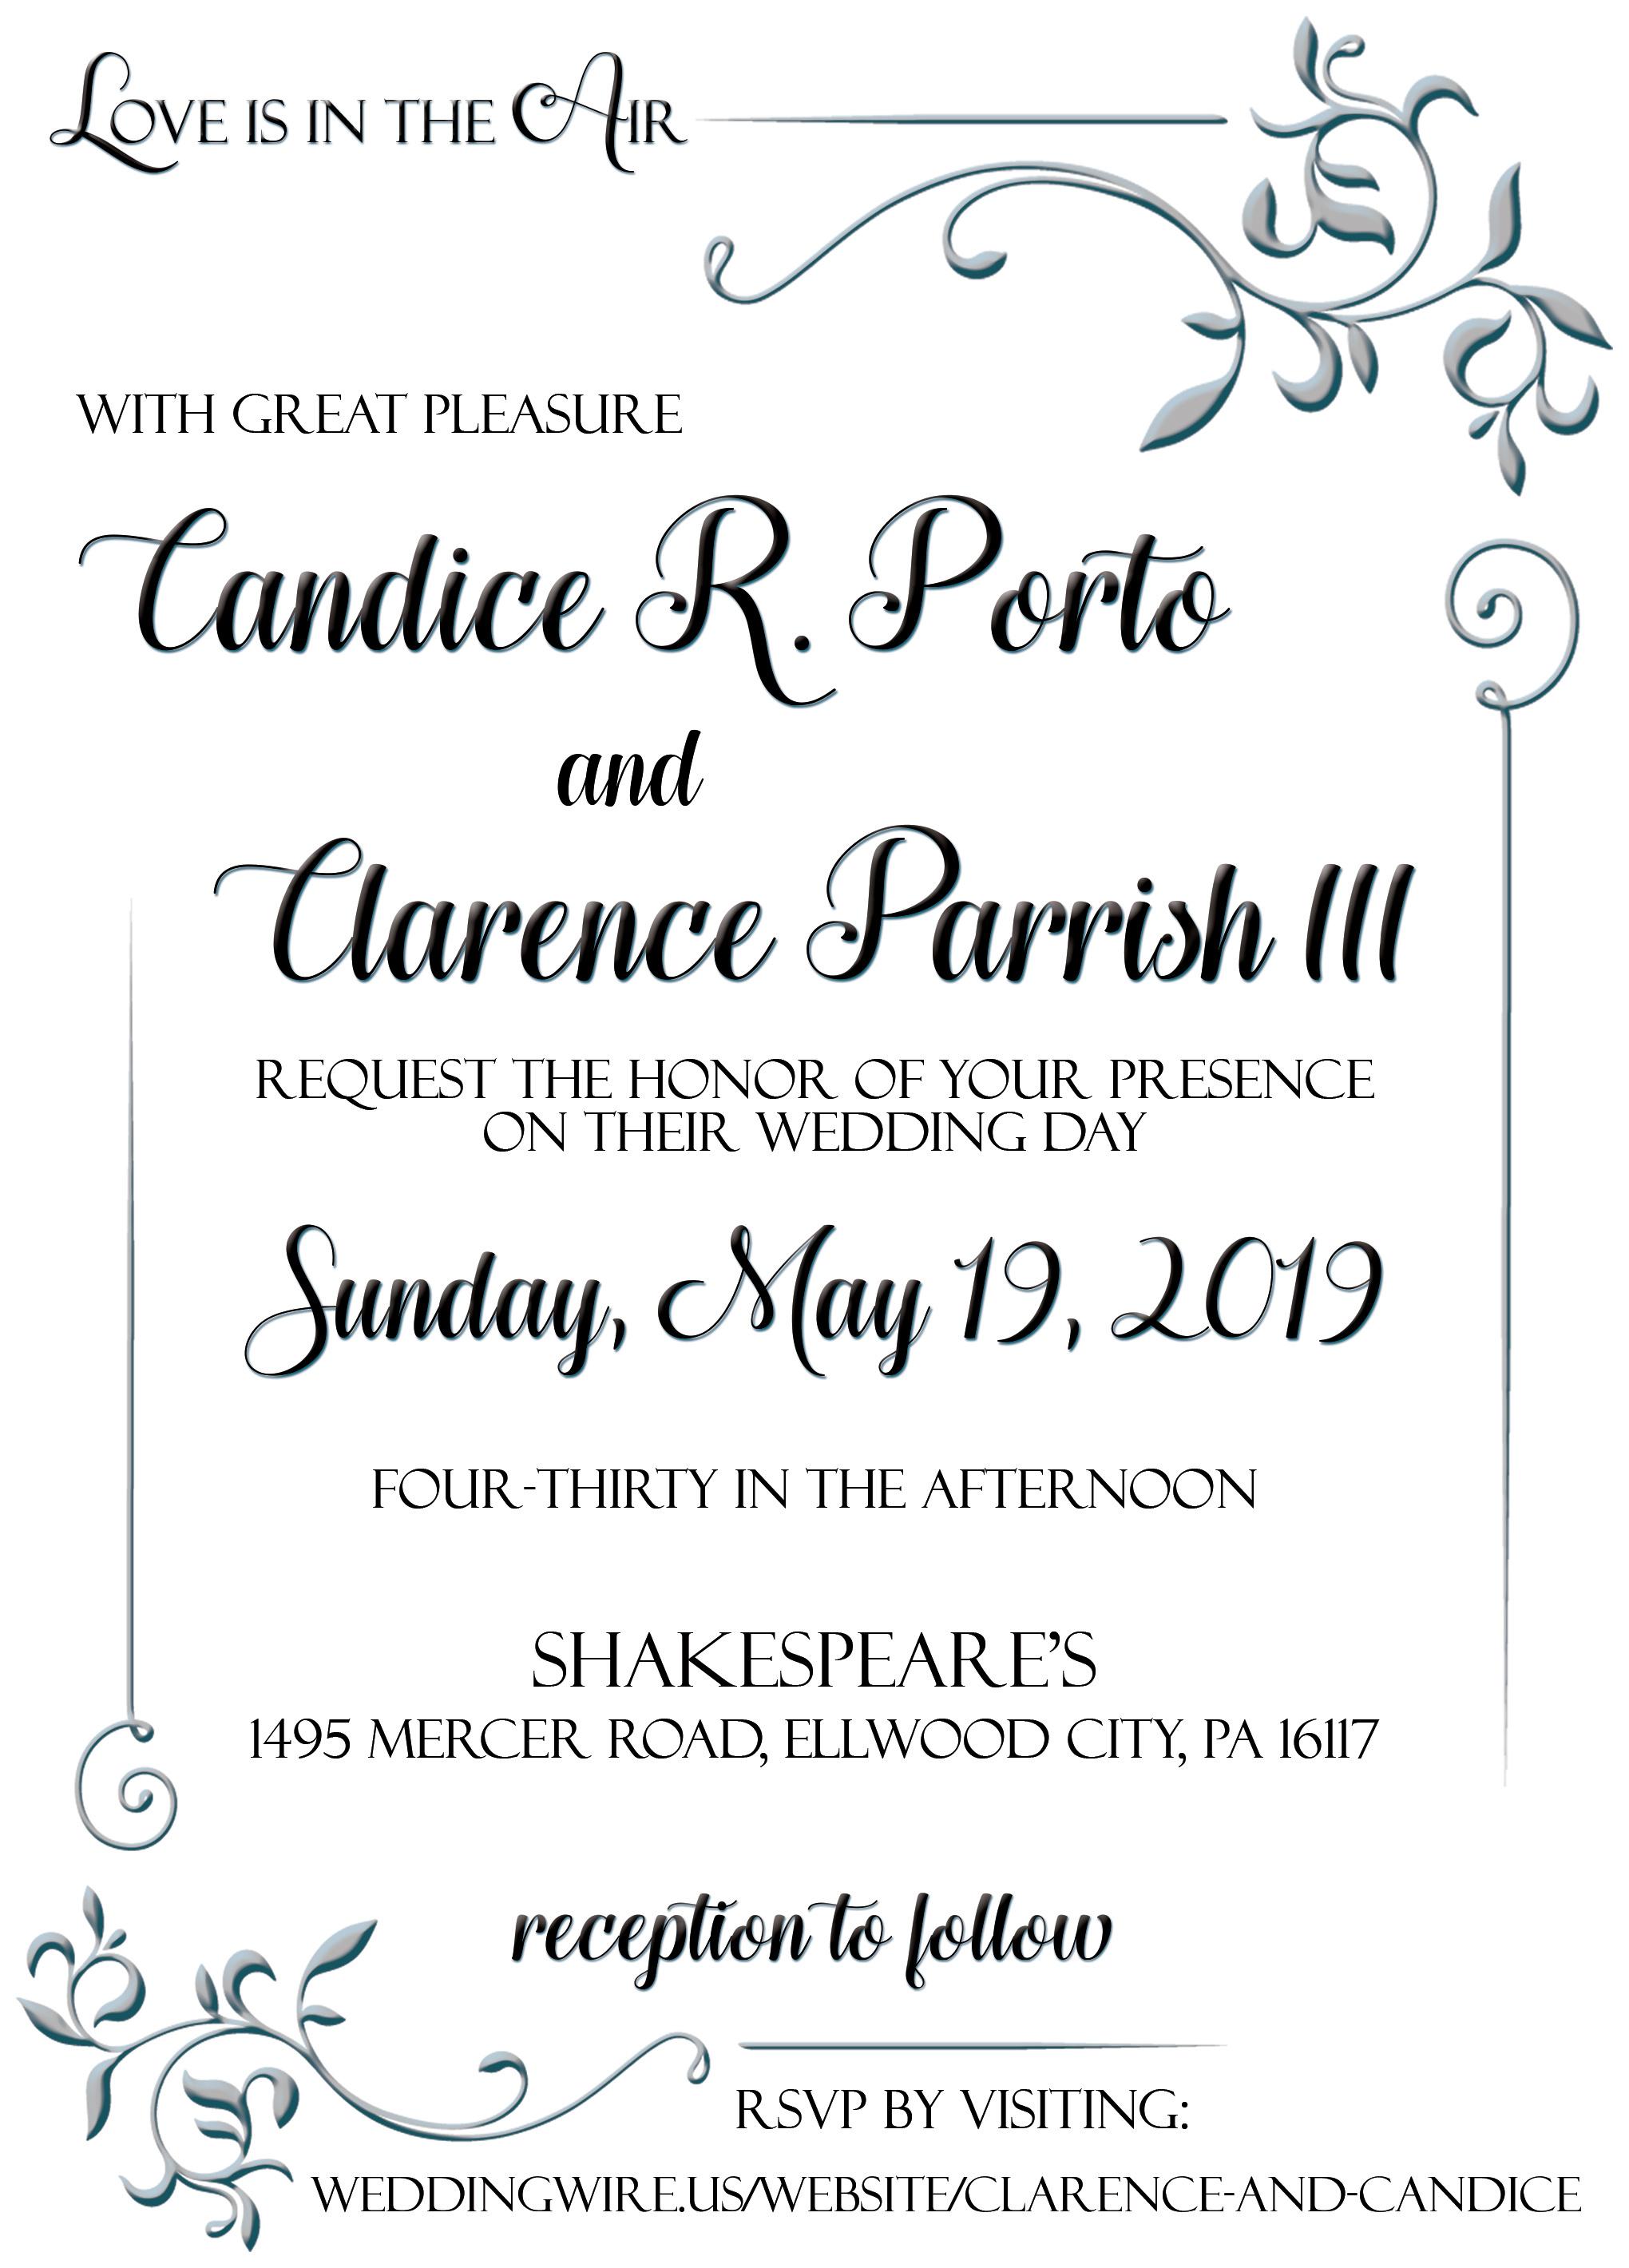 Parrish Wedding Invitation final